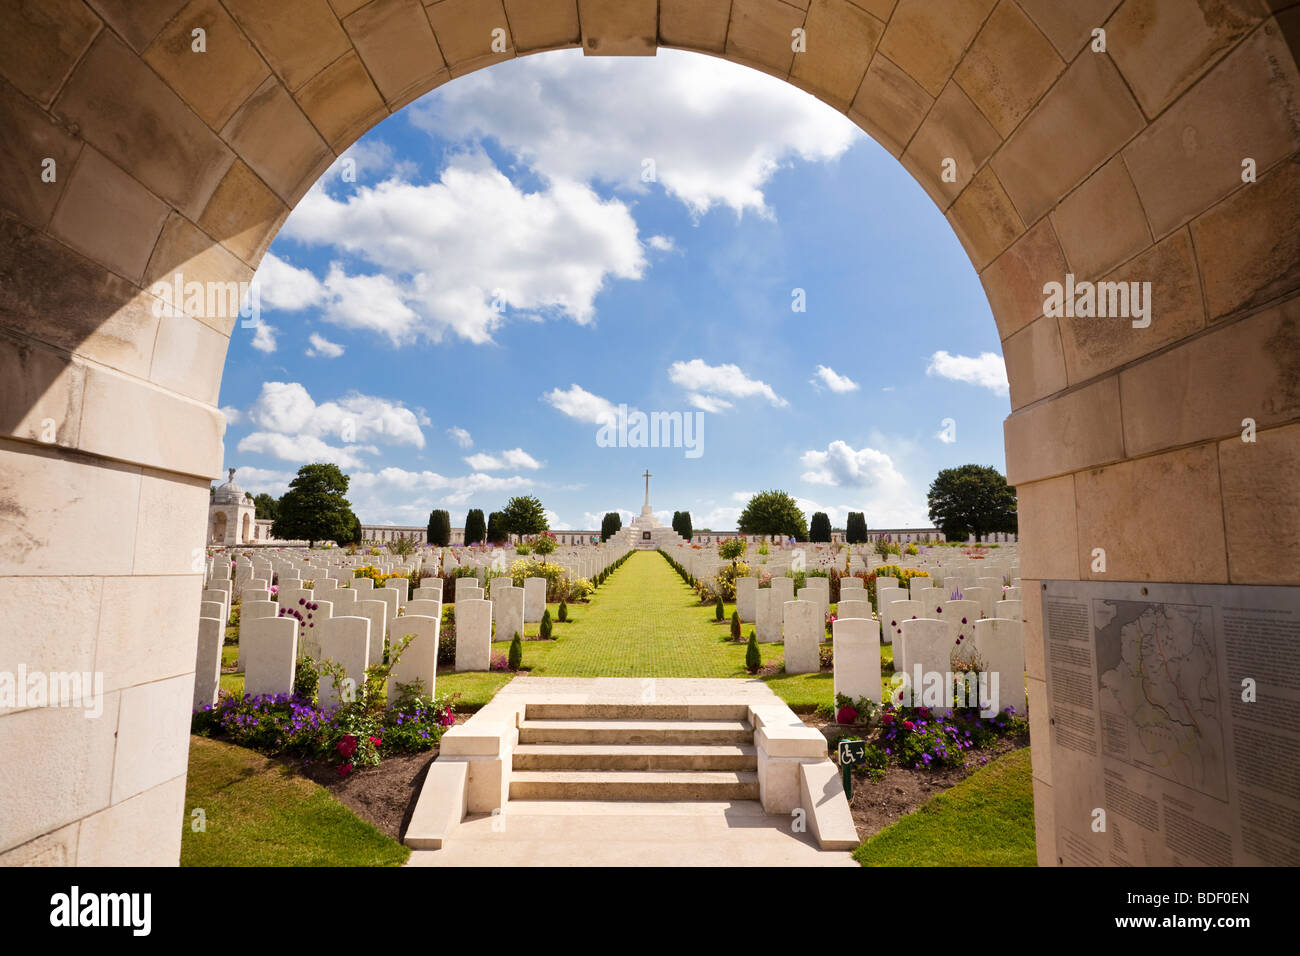 Tyne Cot WW1 Commonwealth military cemetery at Passchendaele, Flanders, Belgium, Europe - Stock Image